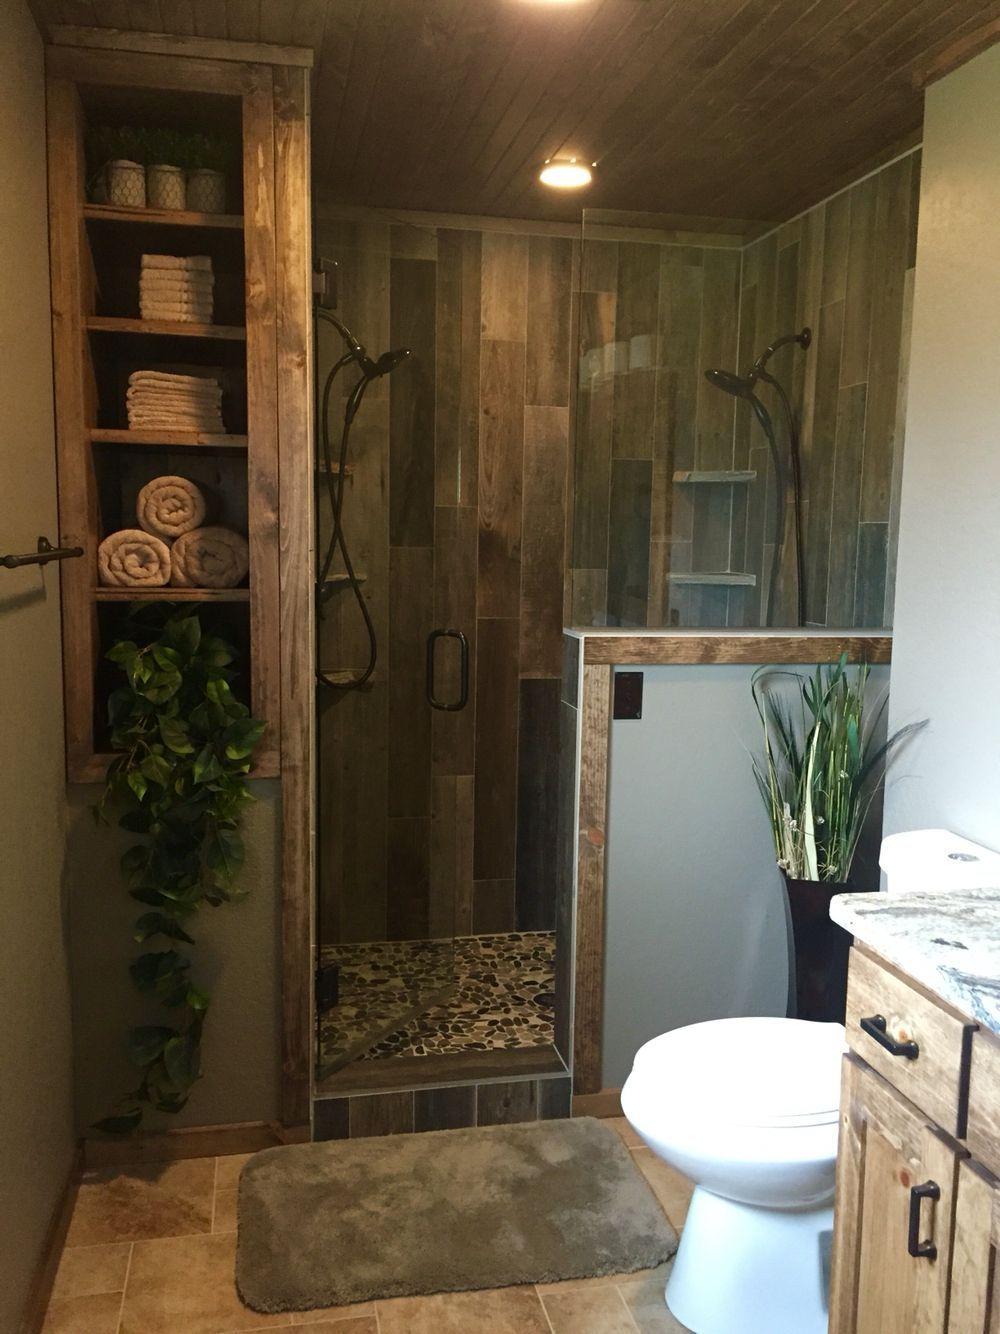 19 excellent grey bathroom ideas farmhouse bathroom on most popular trend gray kitchen design ideas that suit your kitchen id=50811